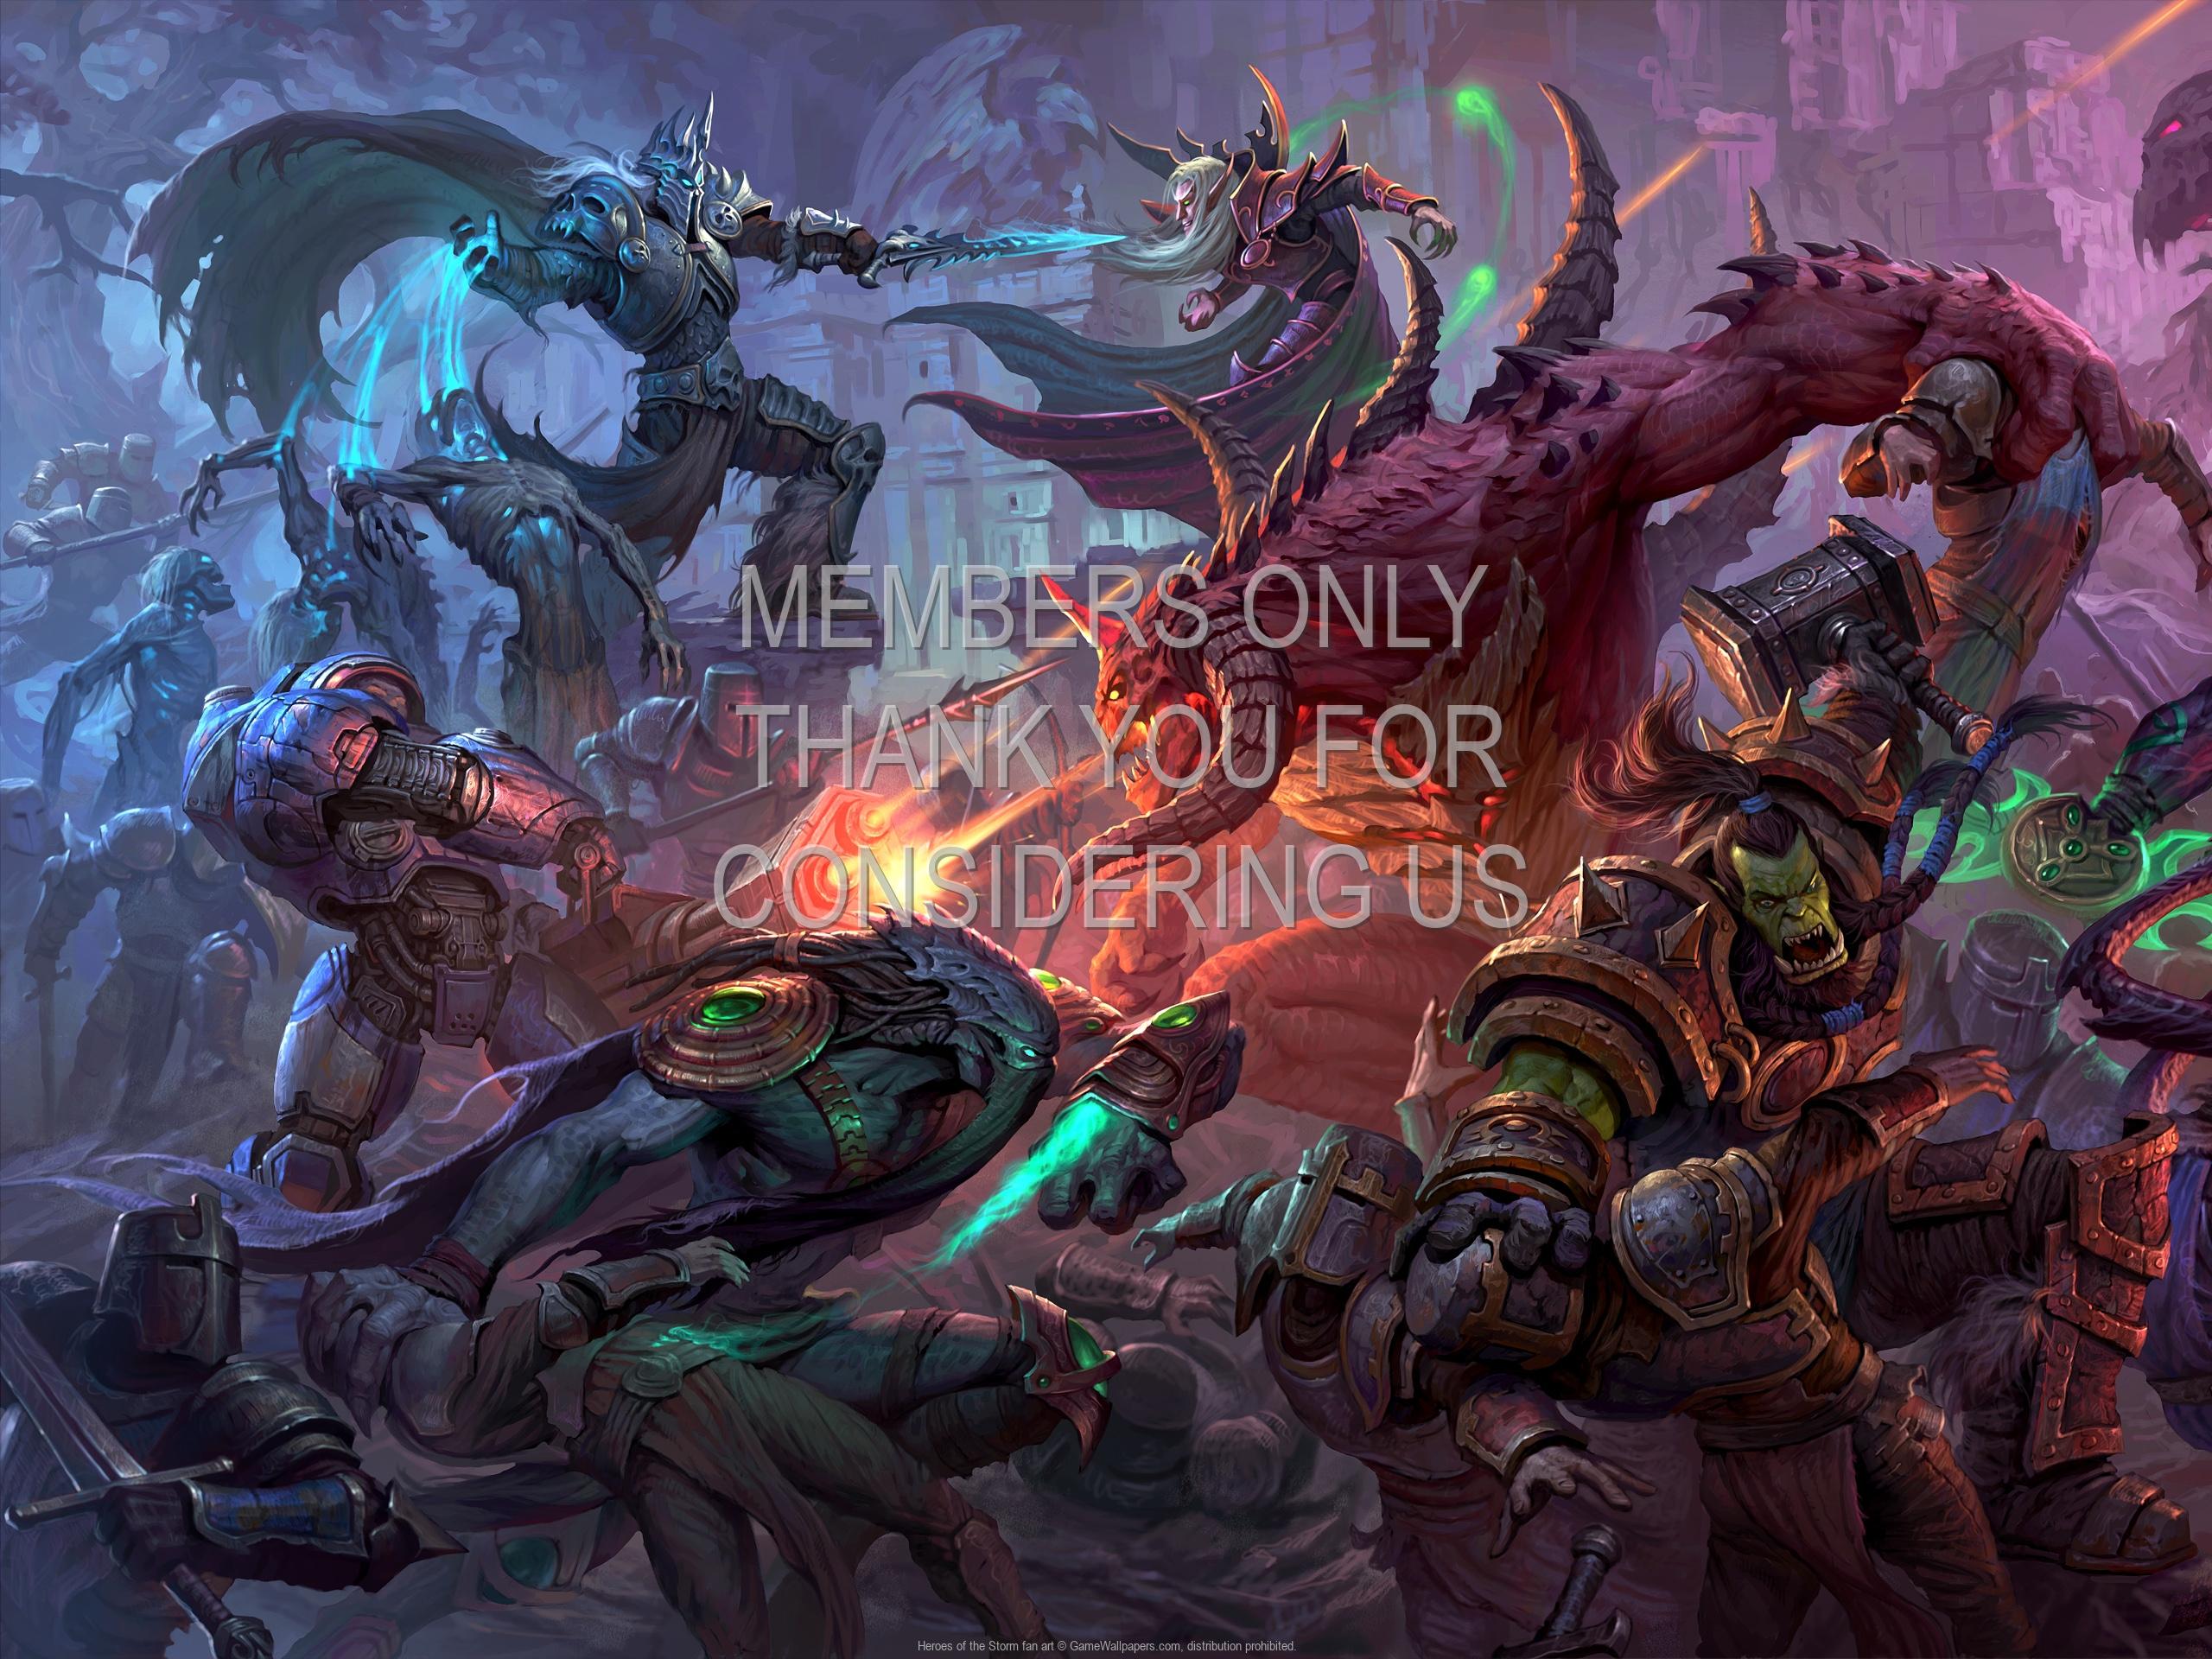 Heroes Of The Storm Wallpaper 1080p: Heroes Of The Storm Fan Art Wallpaper 04 1920x1080